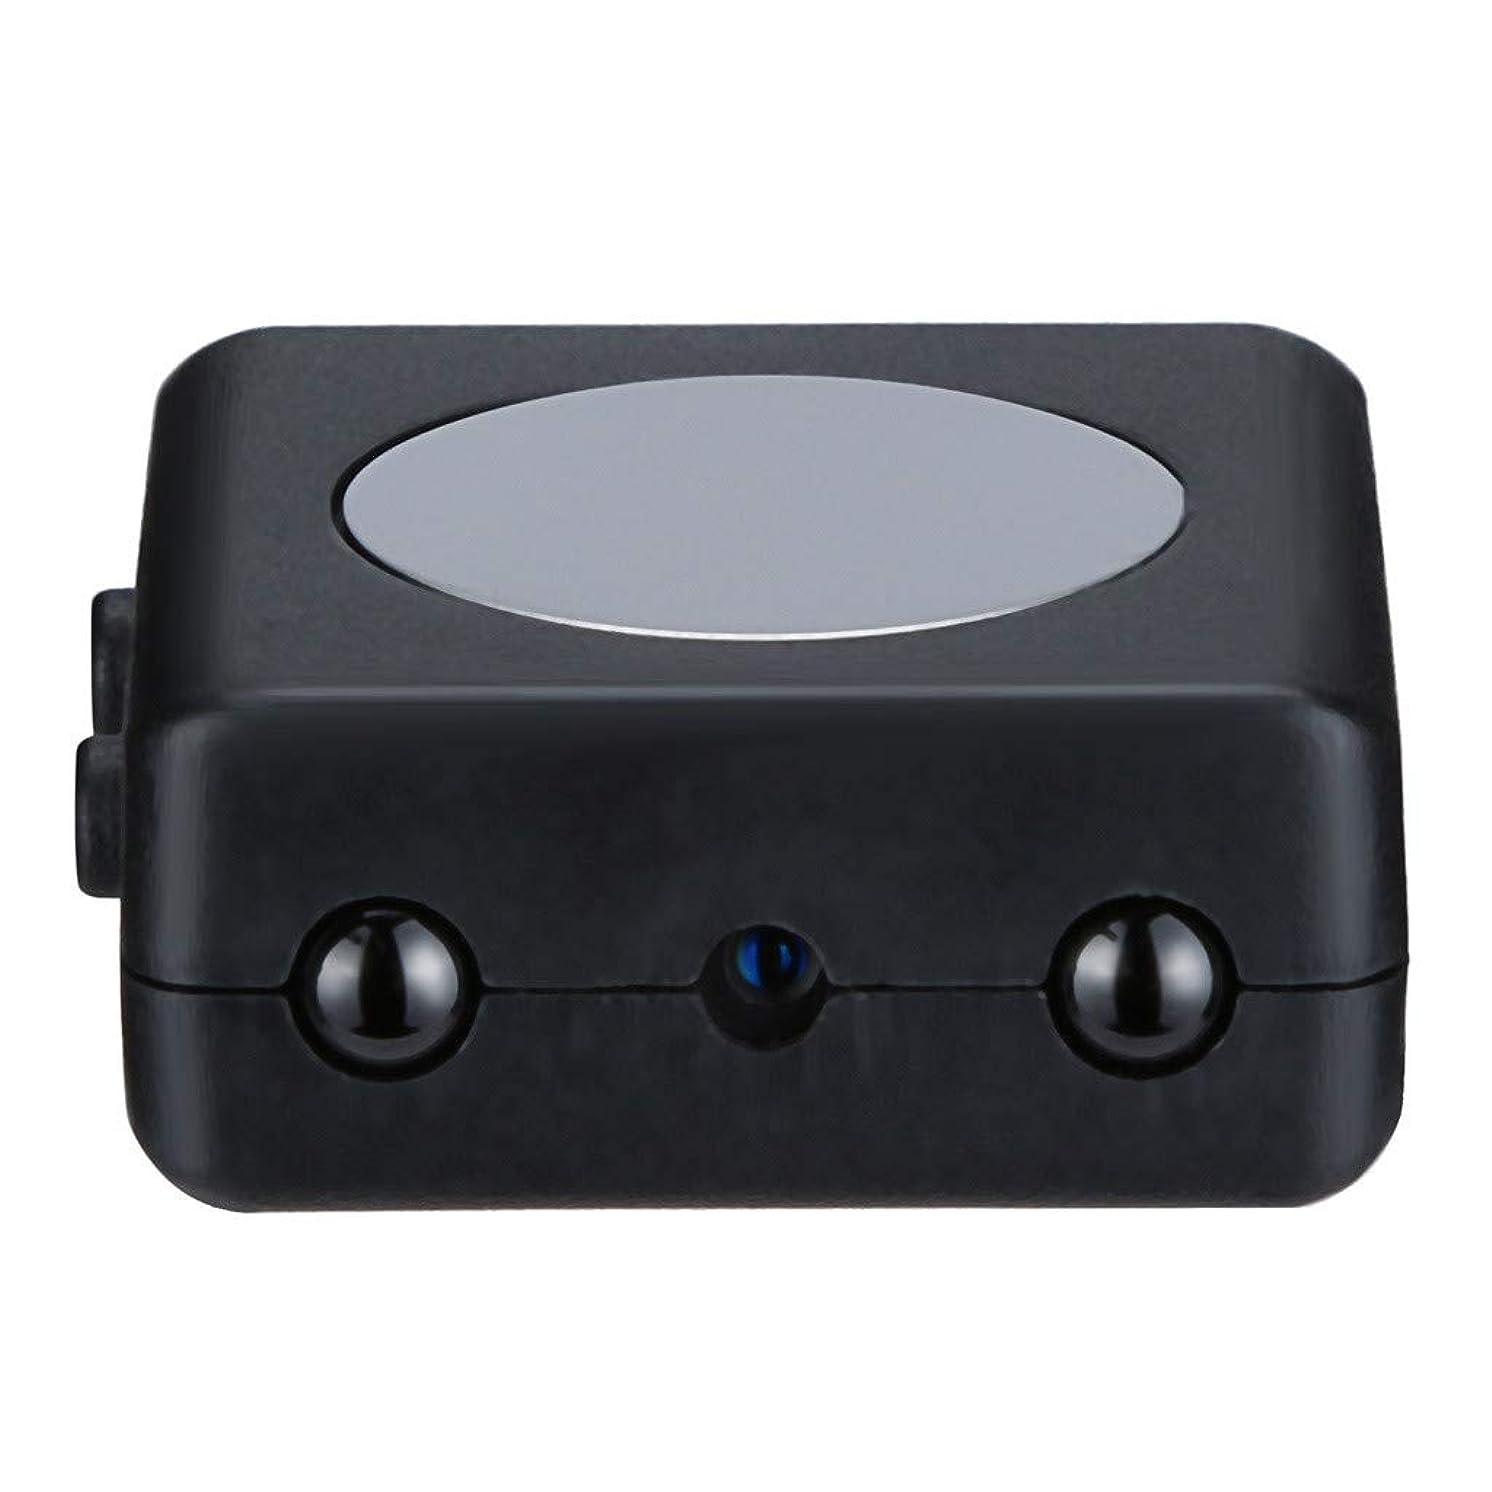 Belloc 2019 HD 1080P Mini Camera Security Cam DVR Night Vision Motion Detection